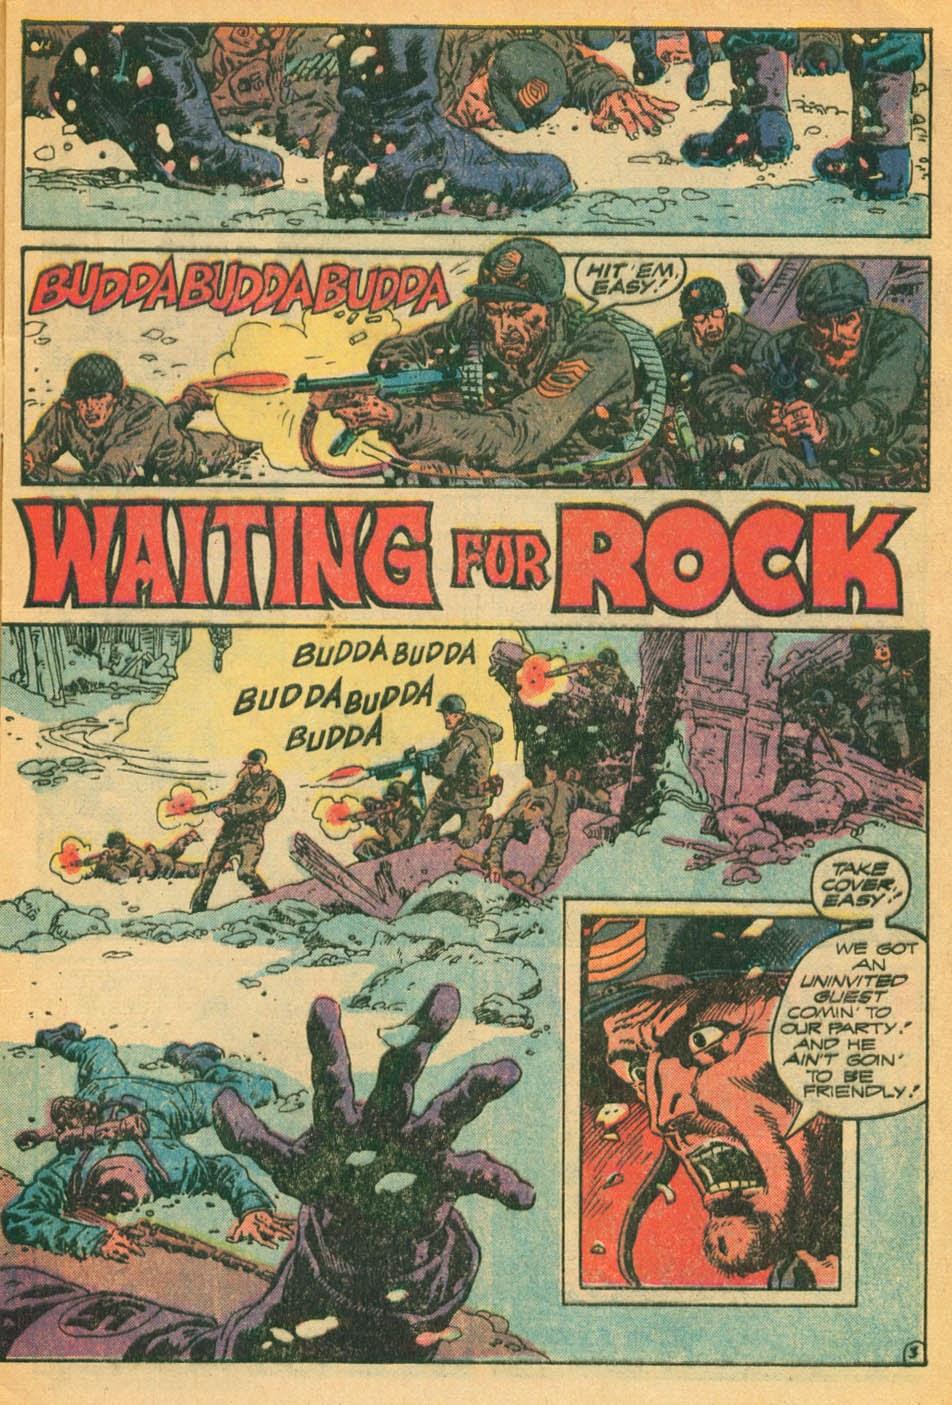 Read online Sgt. Rock comic -  Issue #328 - 4